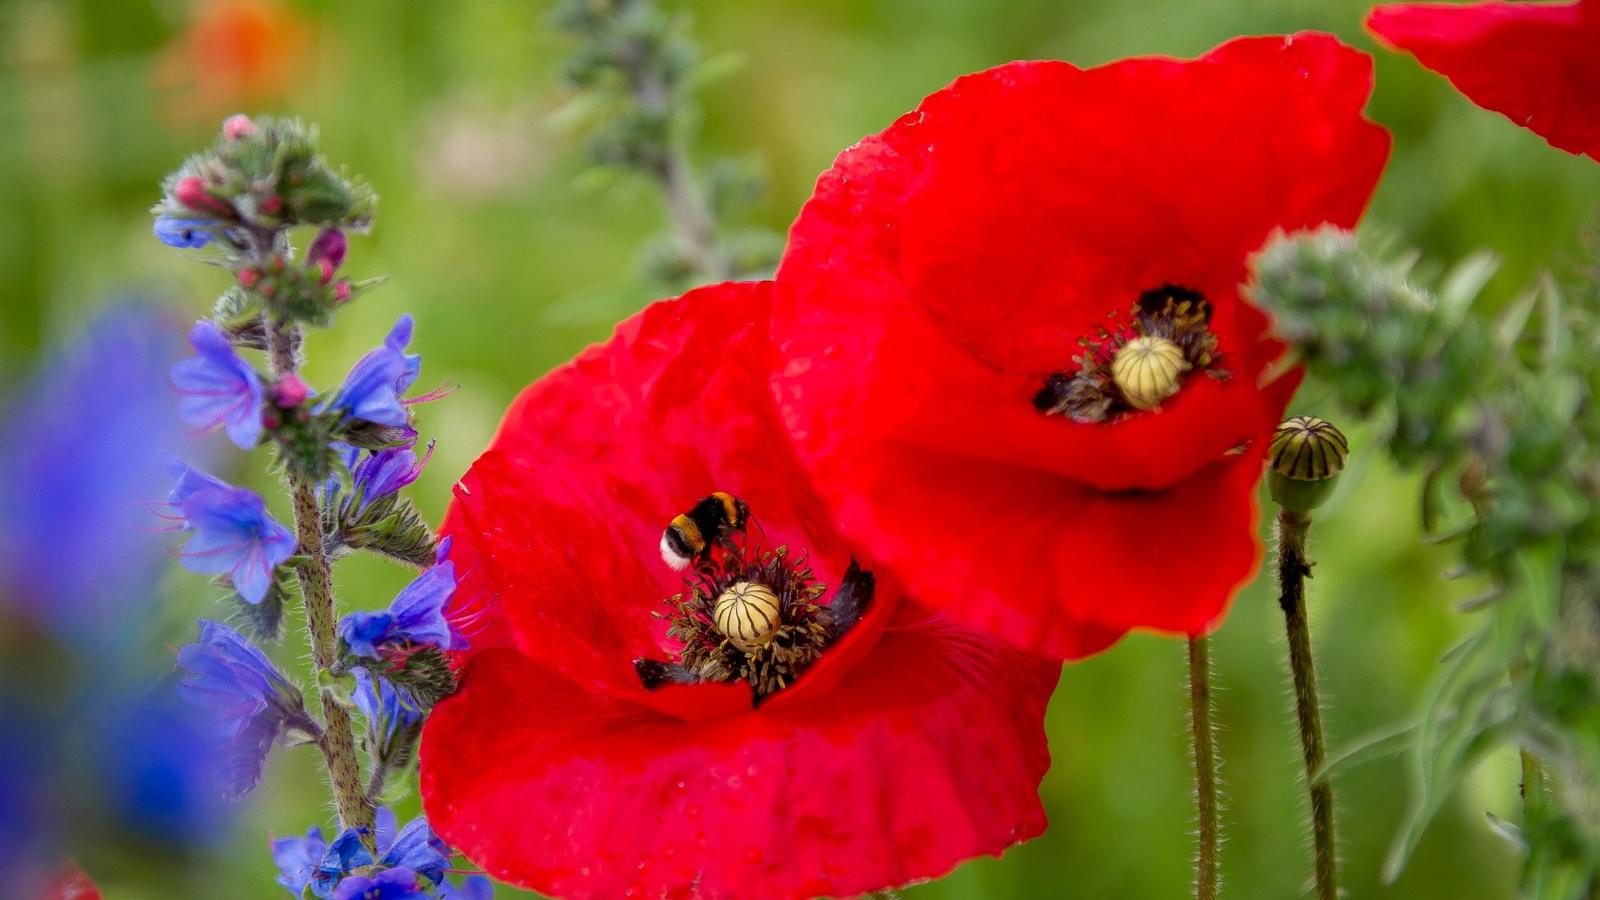 Warning over 'alarming decline' in pollinator species